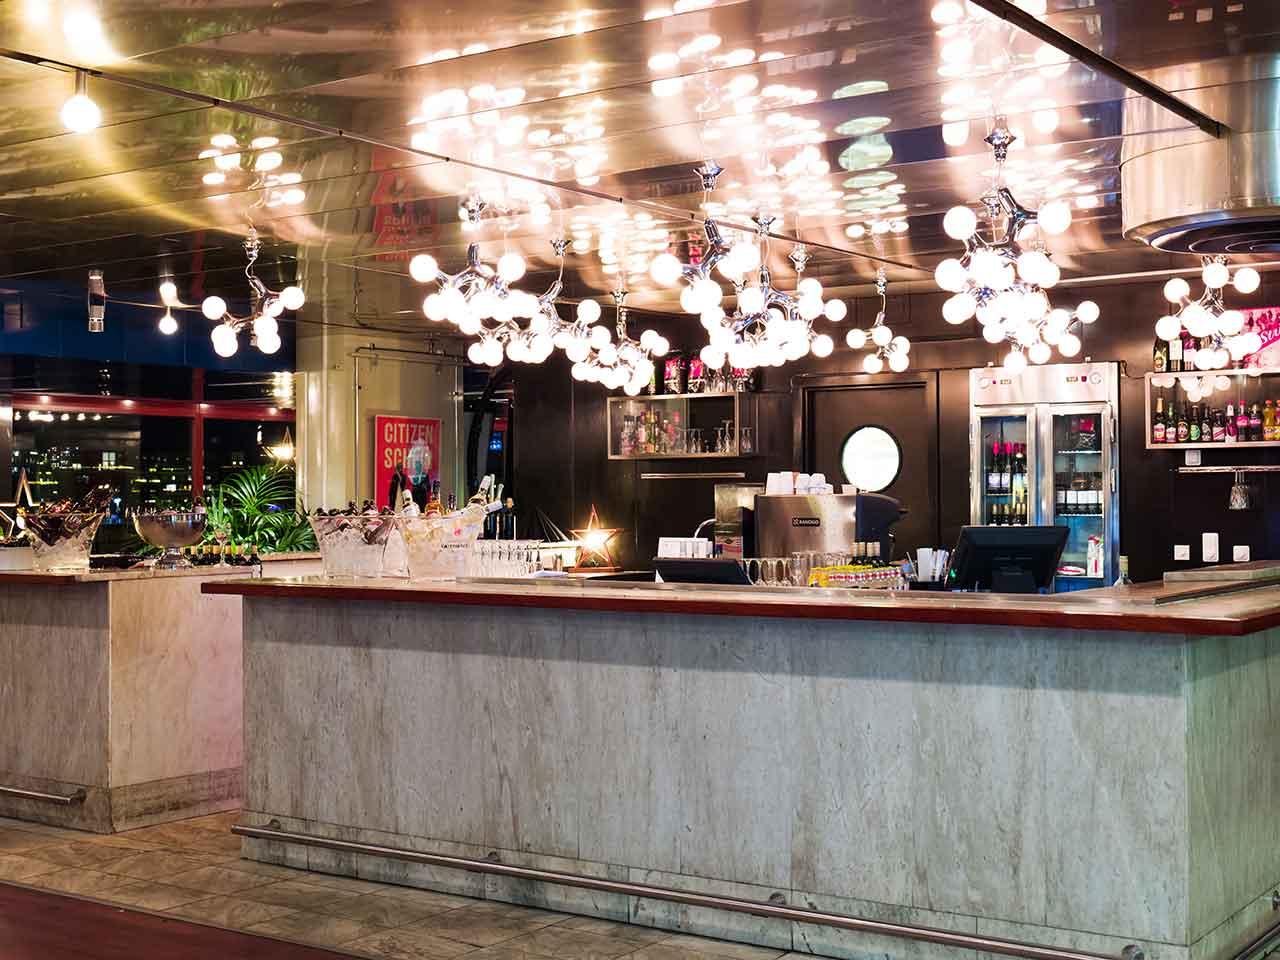 Filmhuset Bar & Bistro - Festvåning nära Karlaplan